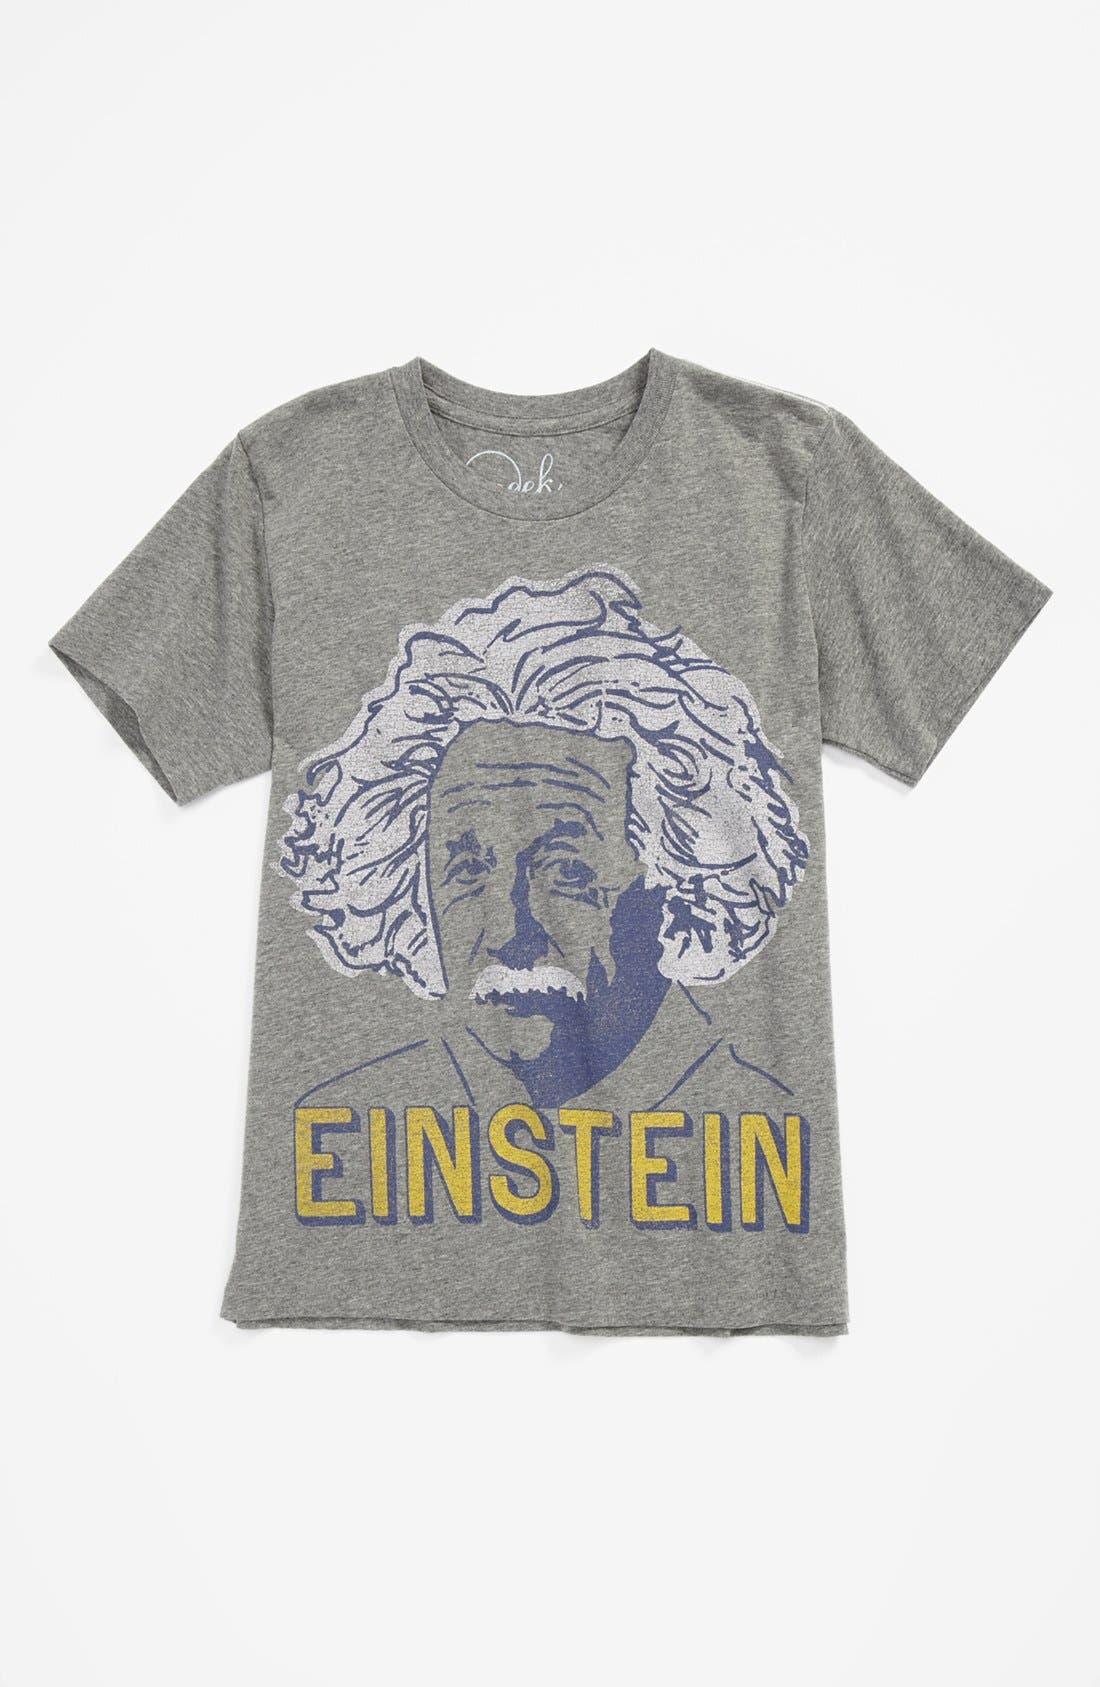 Alternate Image 1 Selected - Peek 'Einstein' T-Shirt (Toddler Boys, Little Boys & Big Boys)